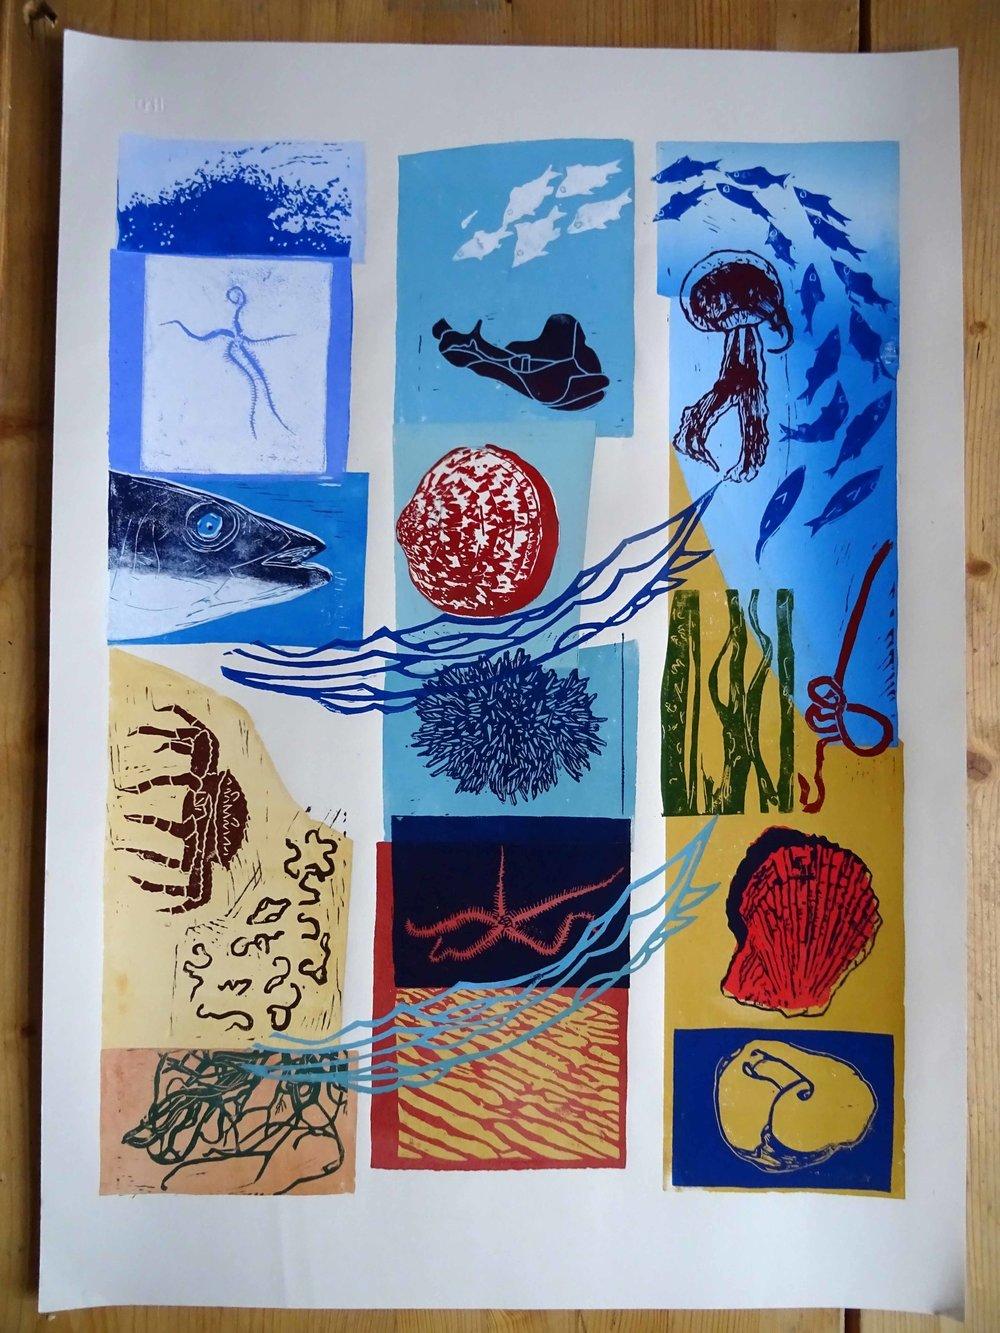 215 - Betes de la mer, 31-plate lino 60x45 cm, 200 €